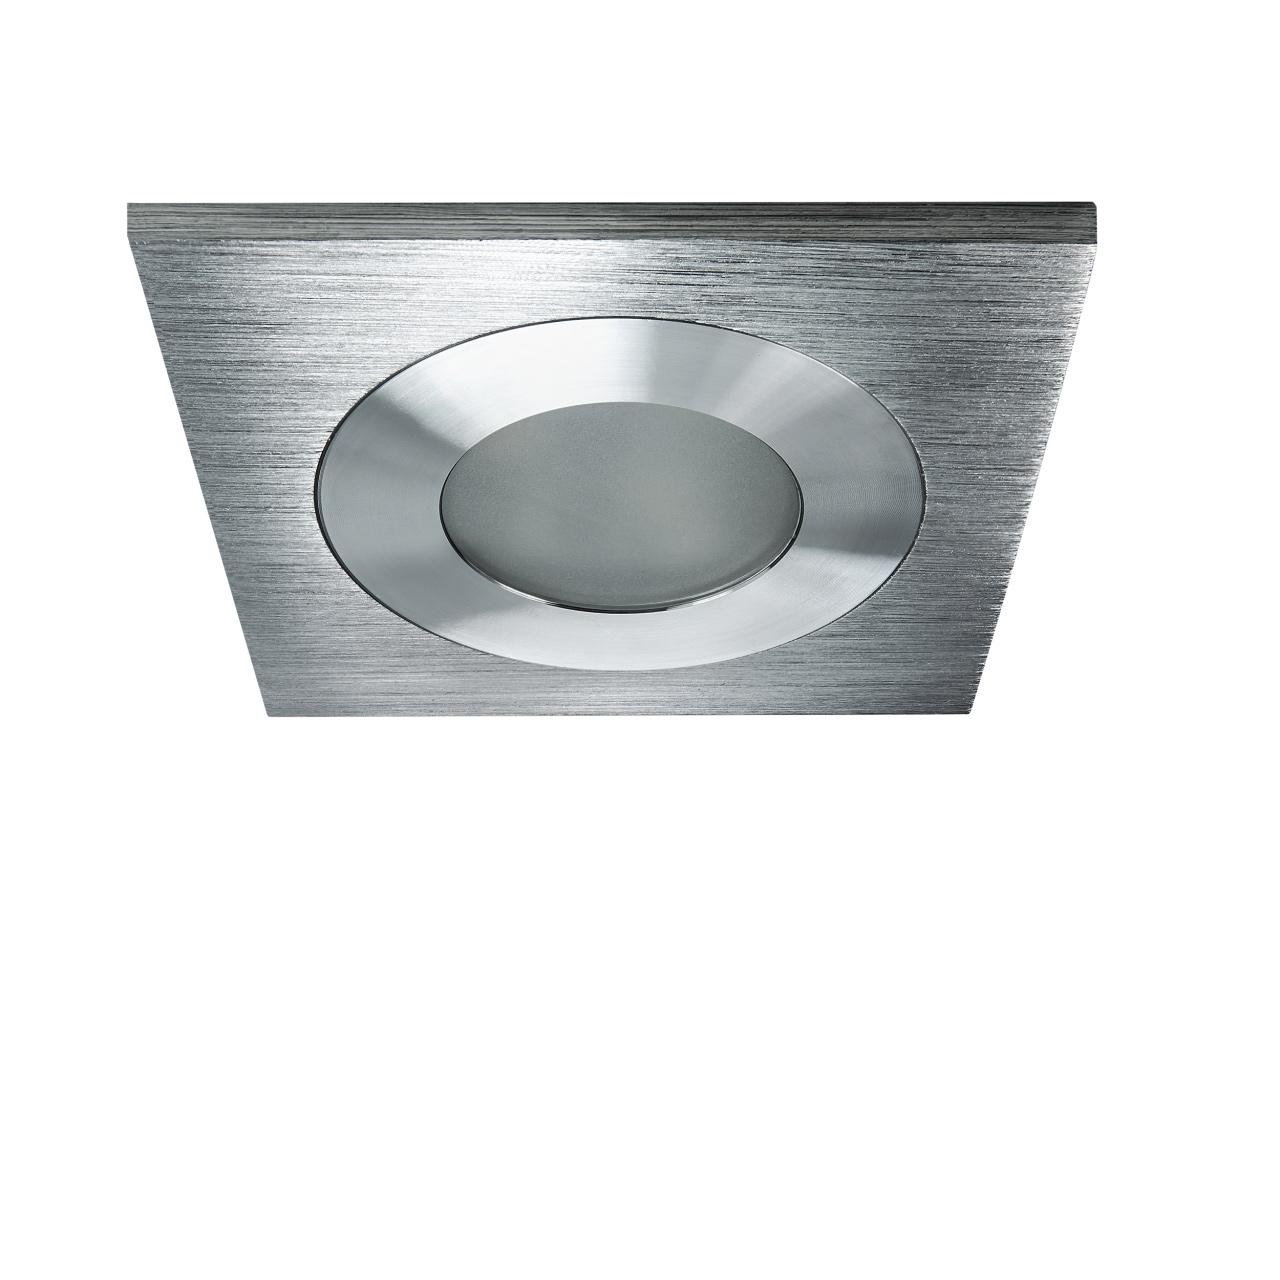 Светильник Leddy quad LED 3W 240LM алюминий 3000K в стену в подрозетник с трансф Lightstar 212180